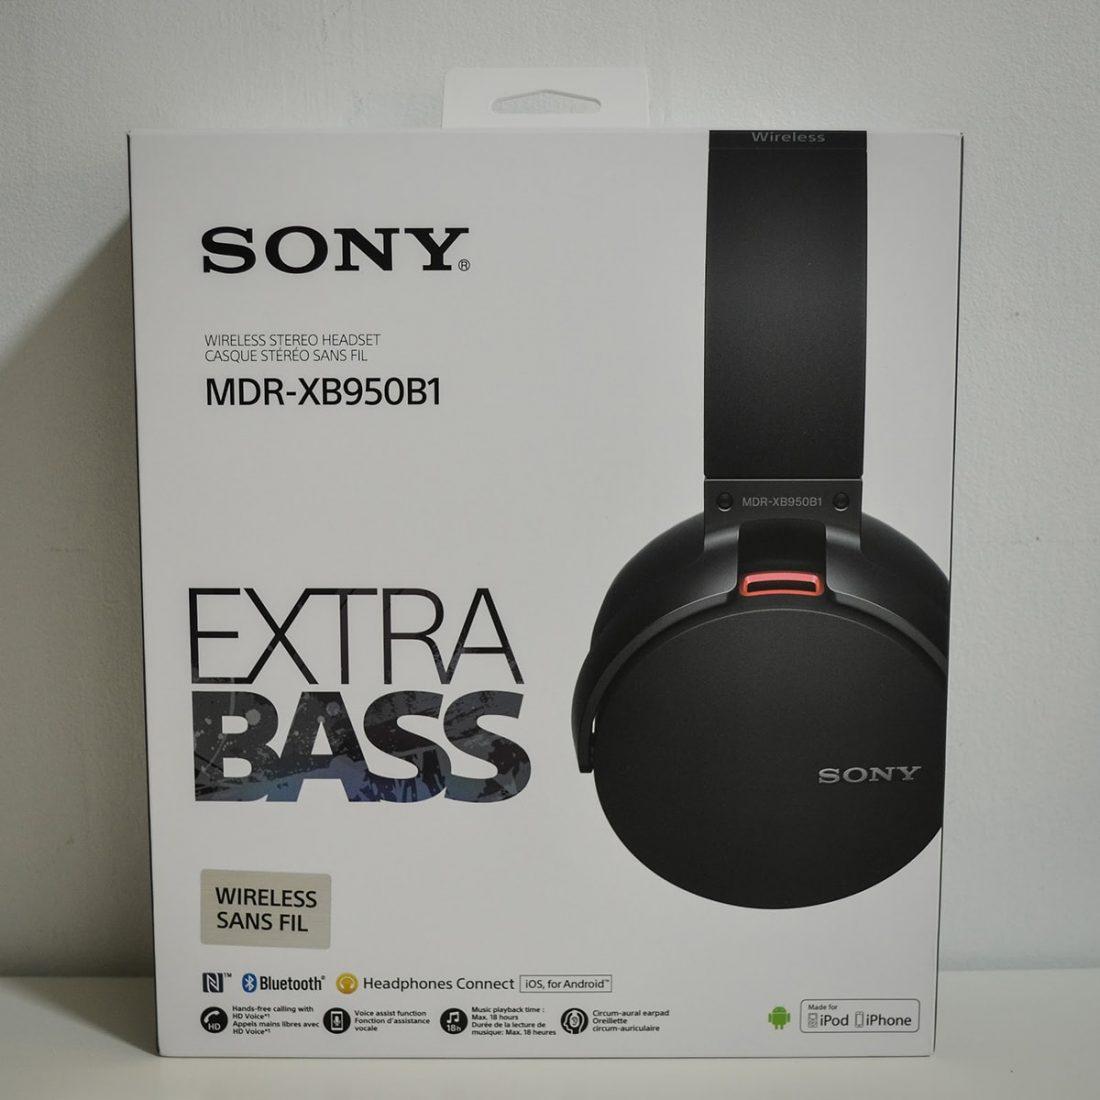 Sony MDR-XB950B1 EXTRA BASS™ Wireless Headphones A